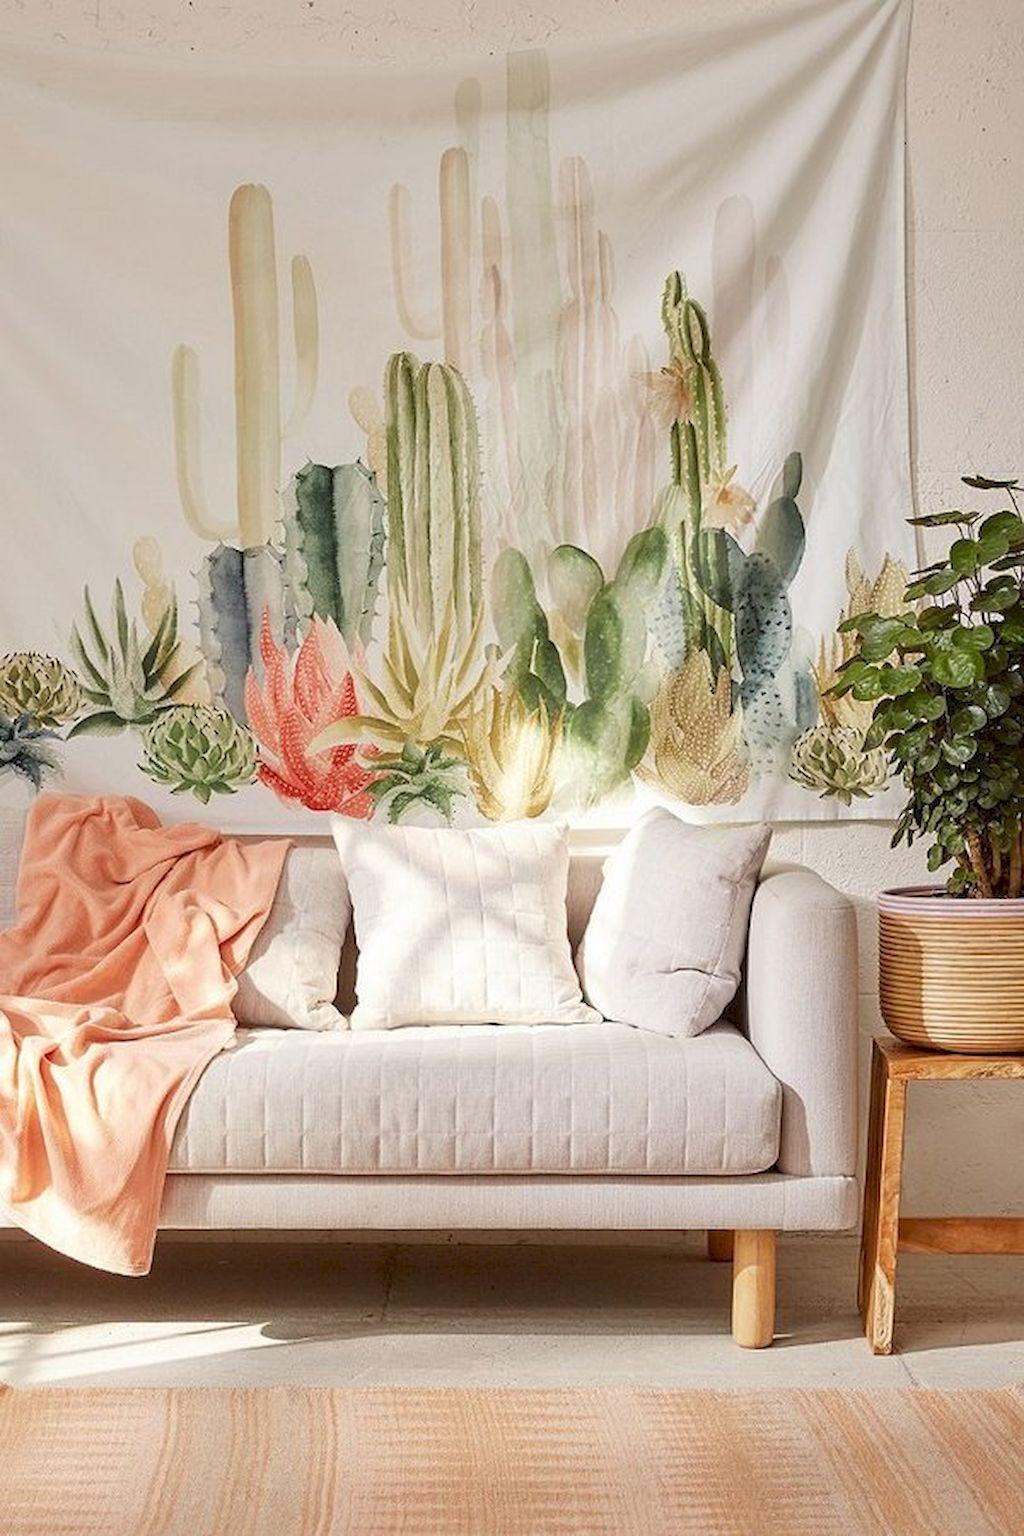 50 Urban Bohemian Living Room Ideas Homeastern Com Bohemian Living Room Bohemian Living Rooms Cheap Home Decor #urban #boho #living #room